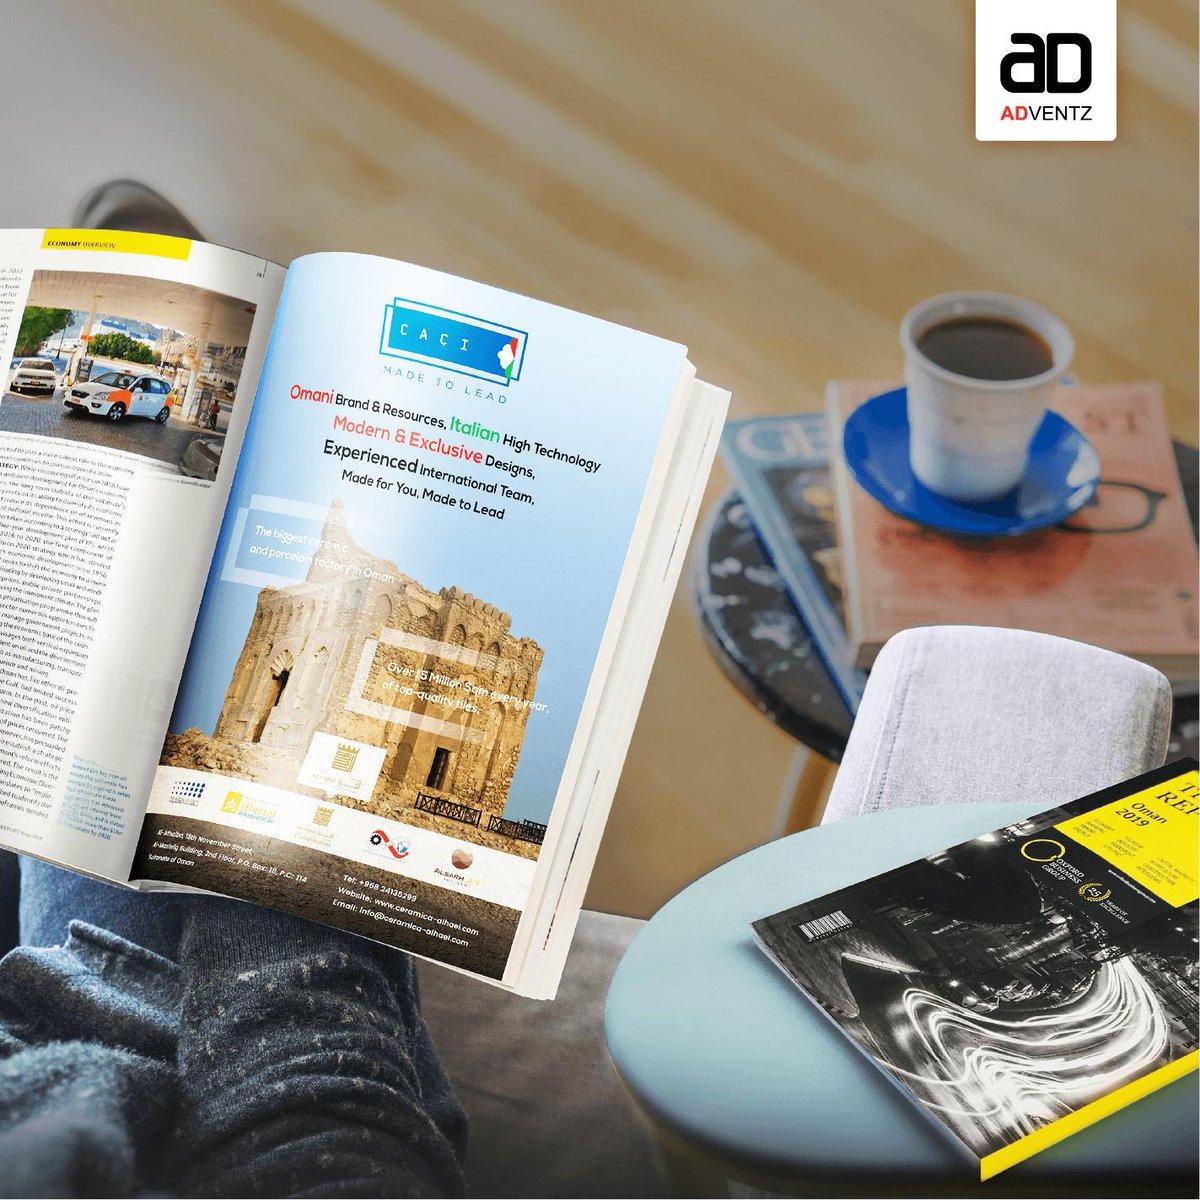 #Omanibusiness #printads #Marketing #printmedia #socialmediamarketing #digitalmarketing #agencylife #growth #media #customers #business #oxfordbusinessgroup #magazine